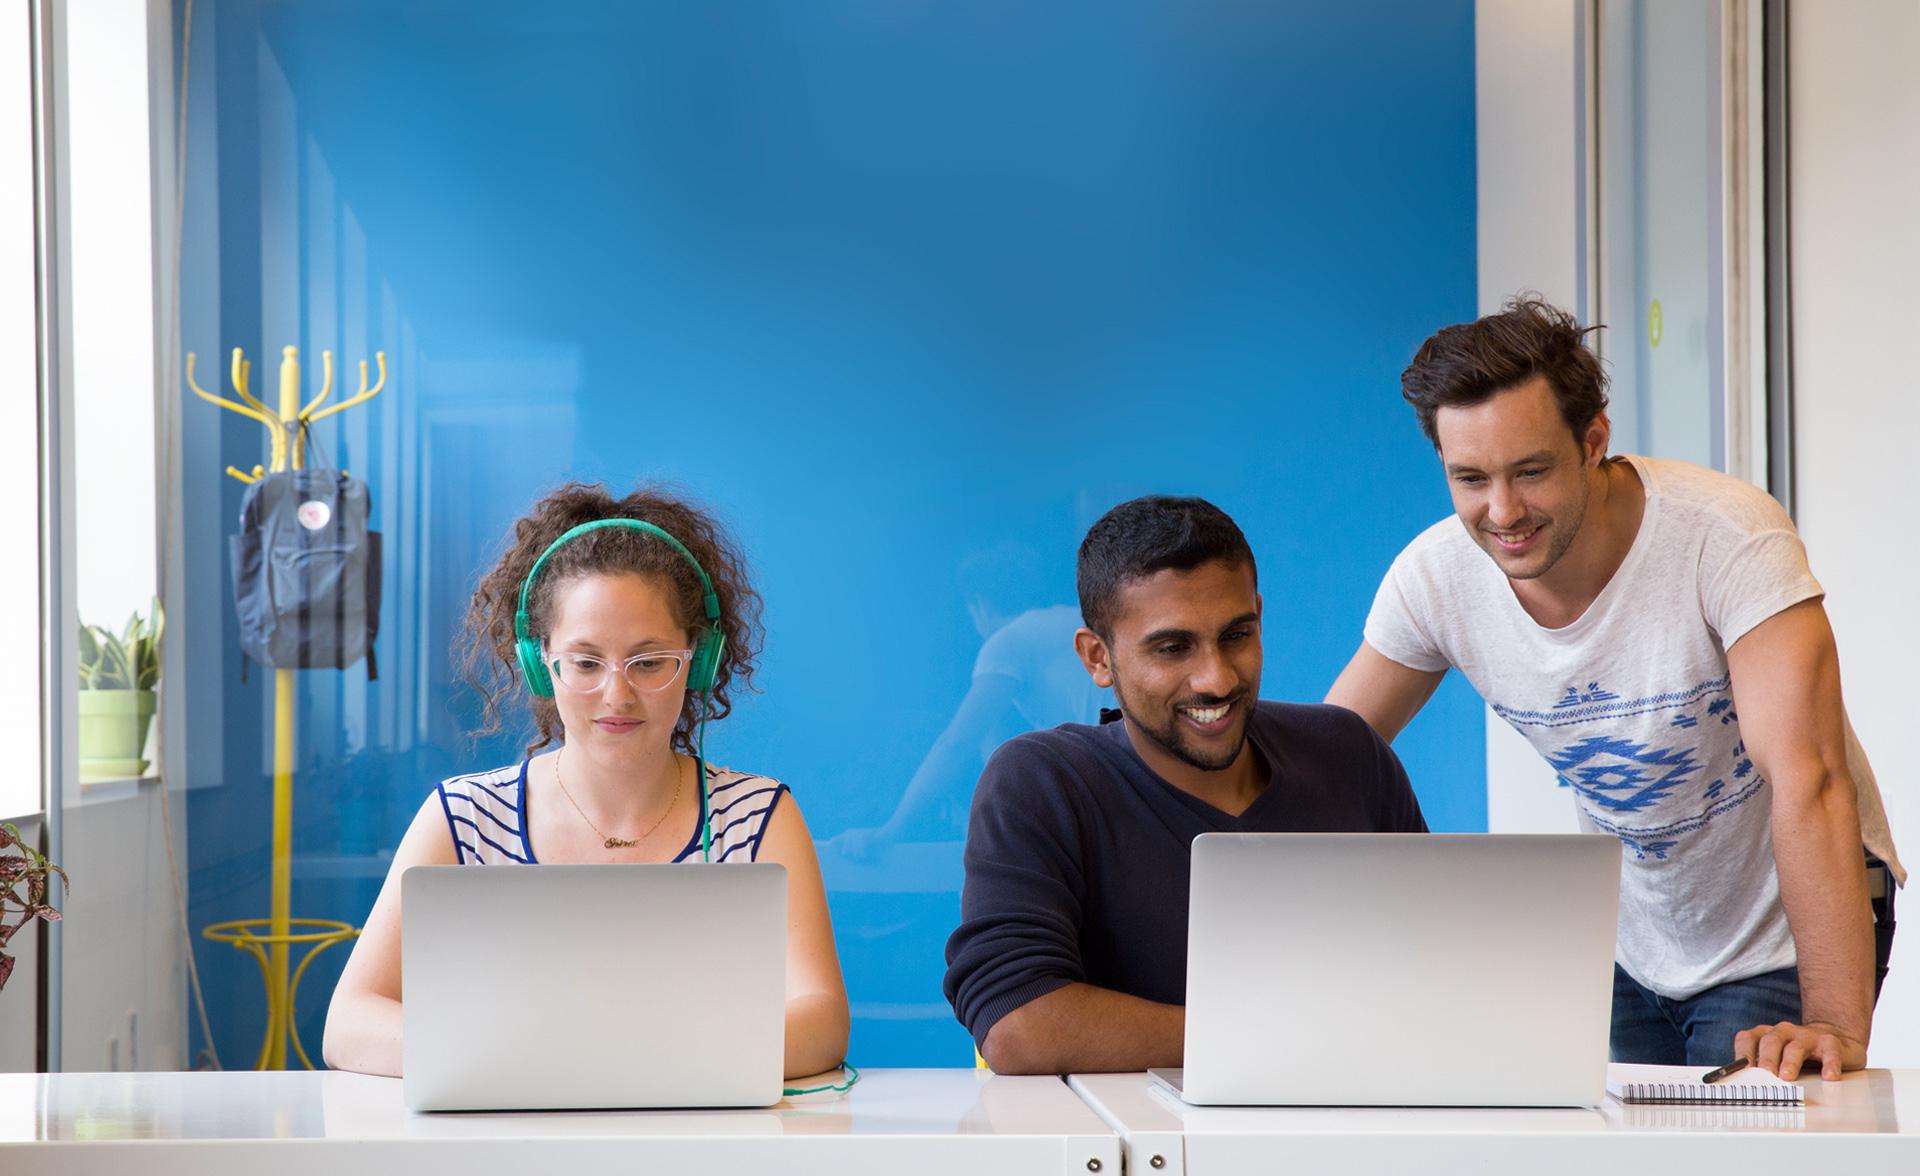 Smiling Wix employees working on laptops